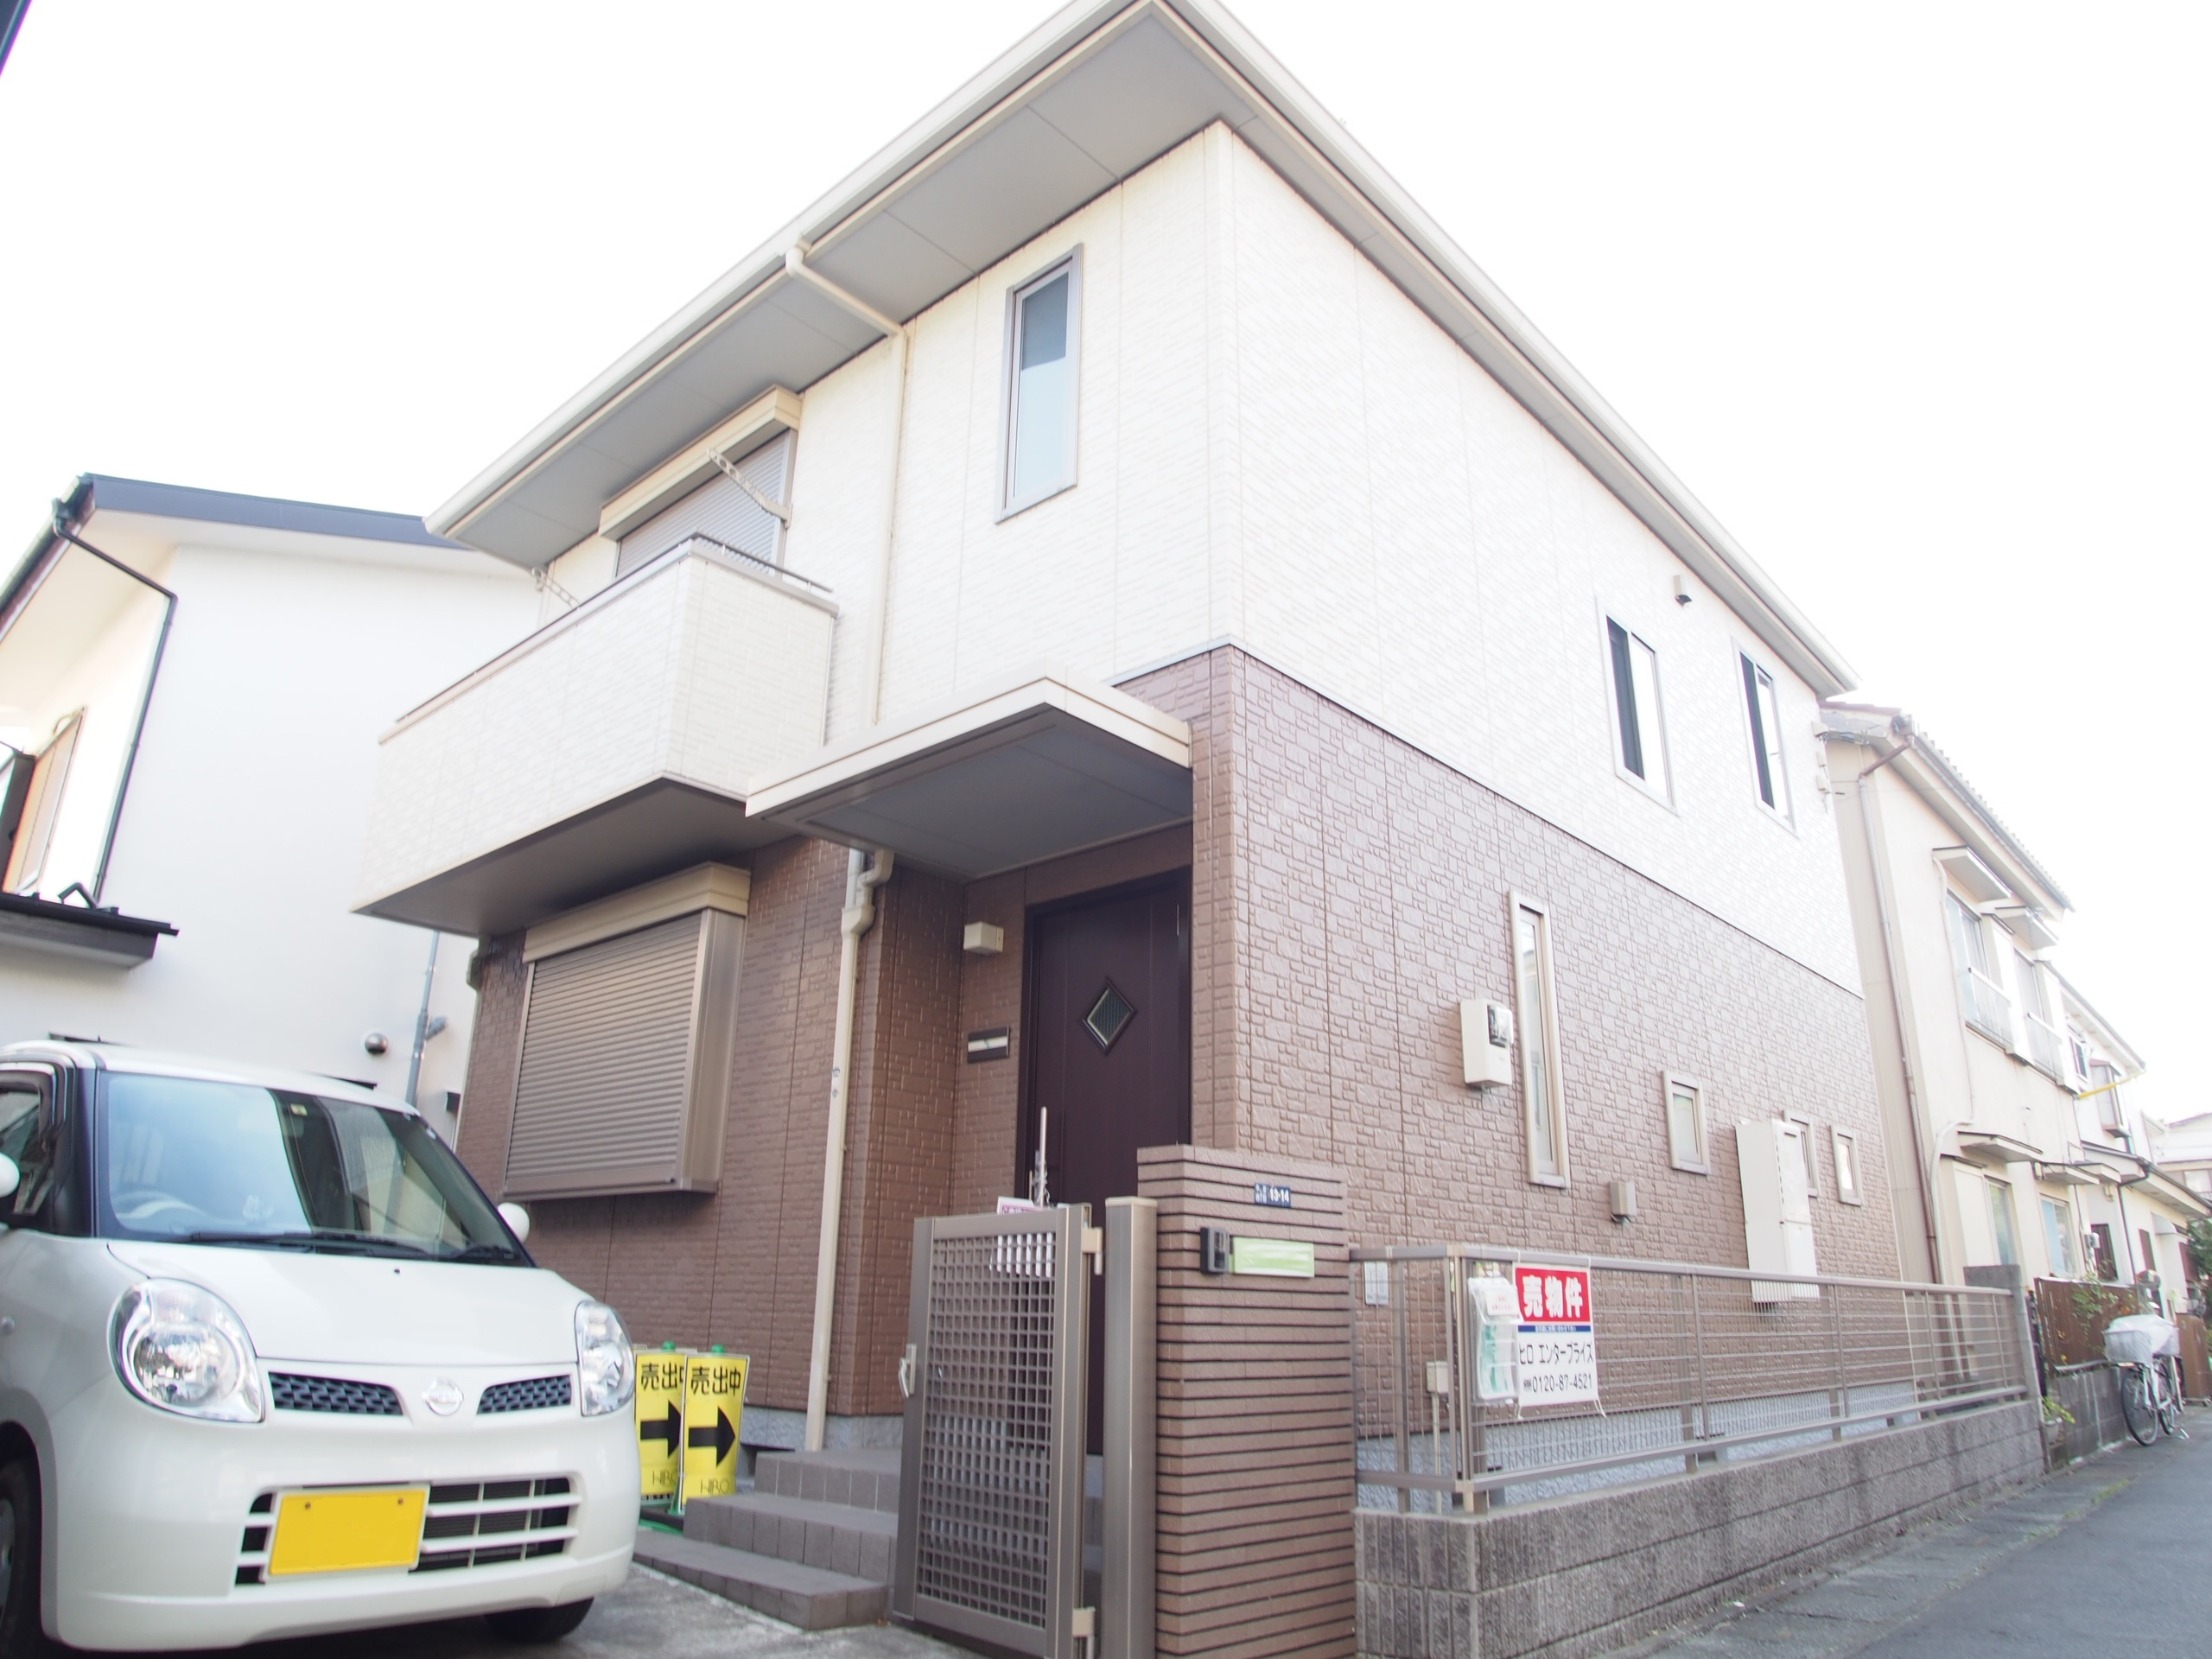 【平塚不動産情報】平塚四丁目 築浅戸建のご紹介!